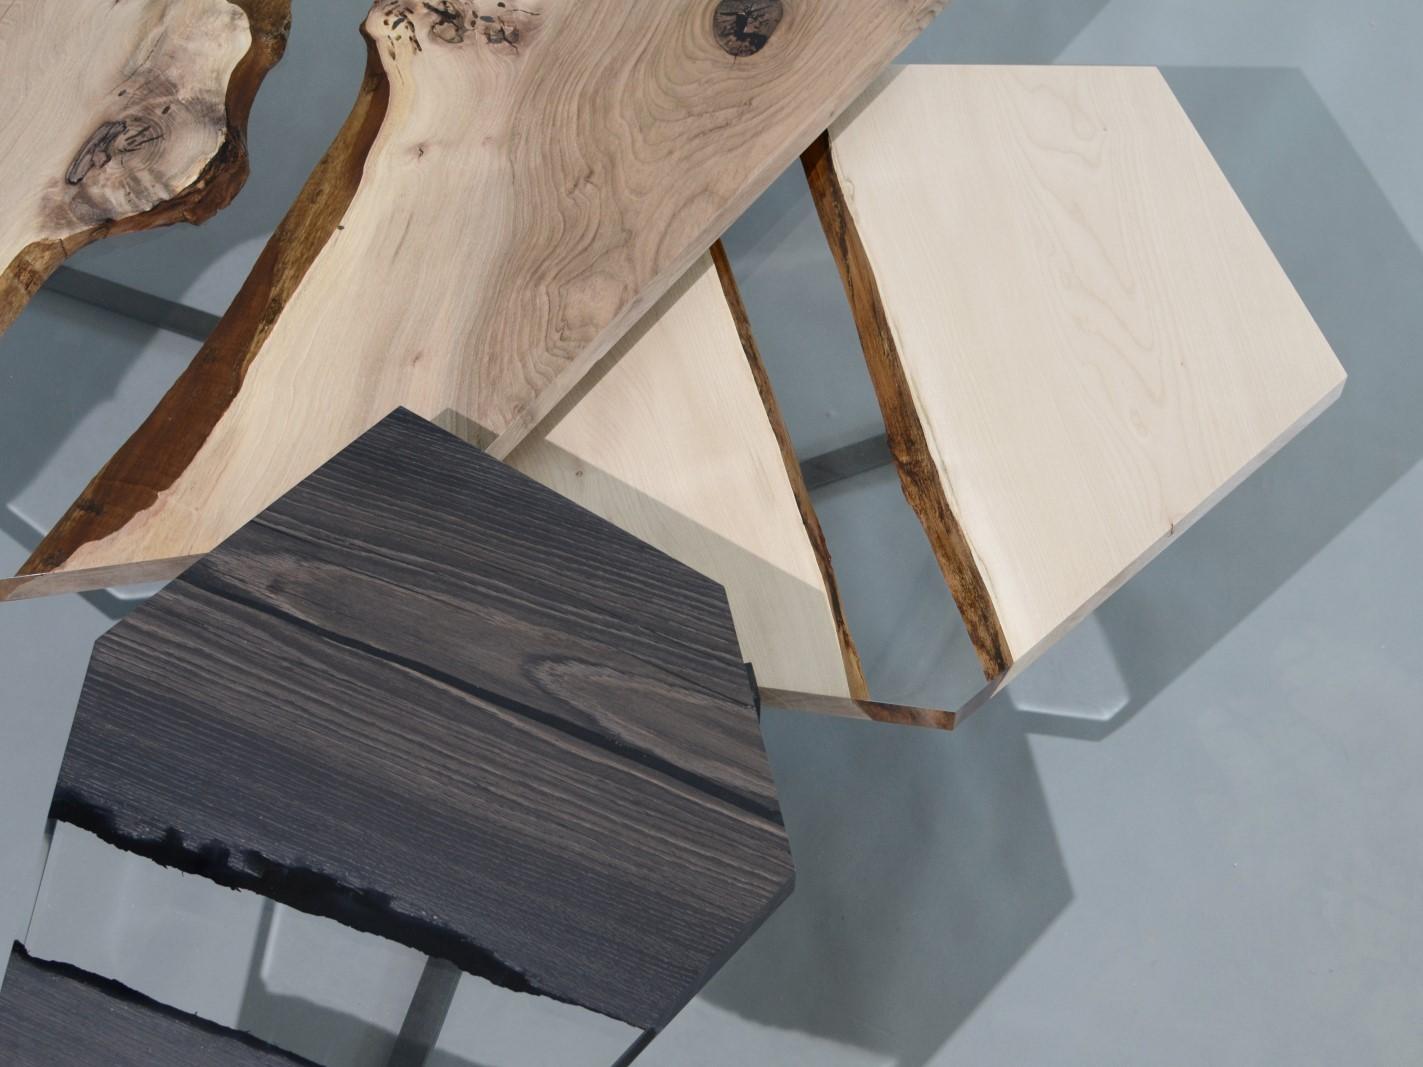 alcarol_crystal wood trio_05